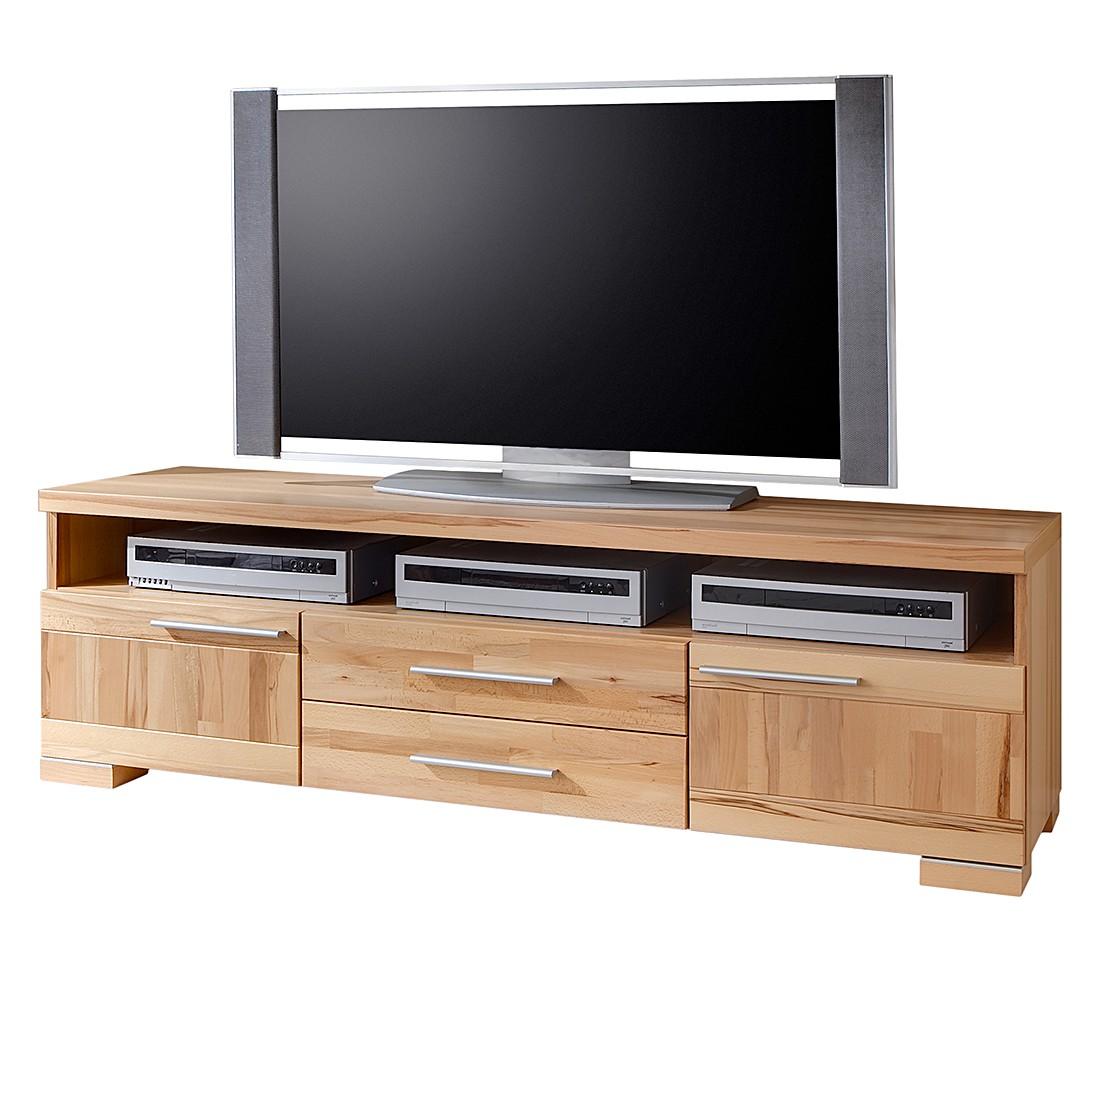 TV-Lowboard Kilian - Kernbuche teilmassiv - Natur, Bellinzona